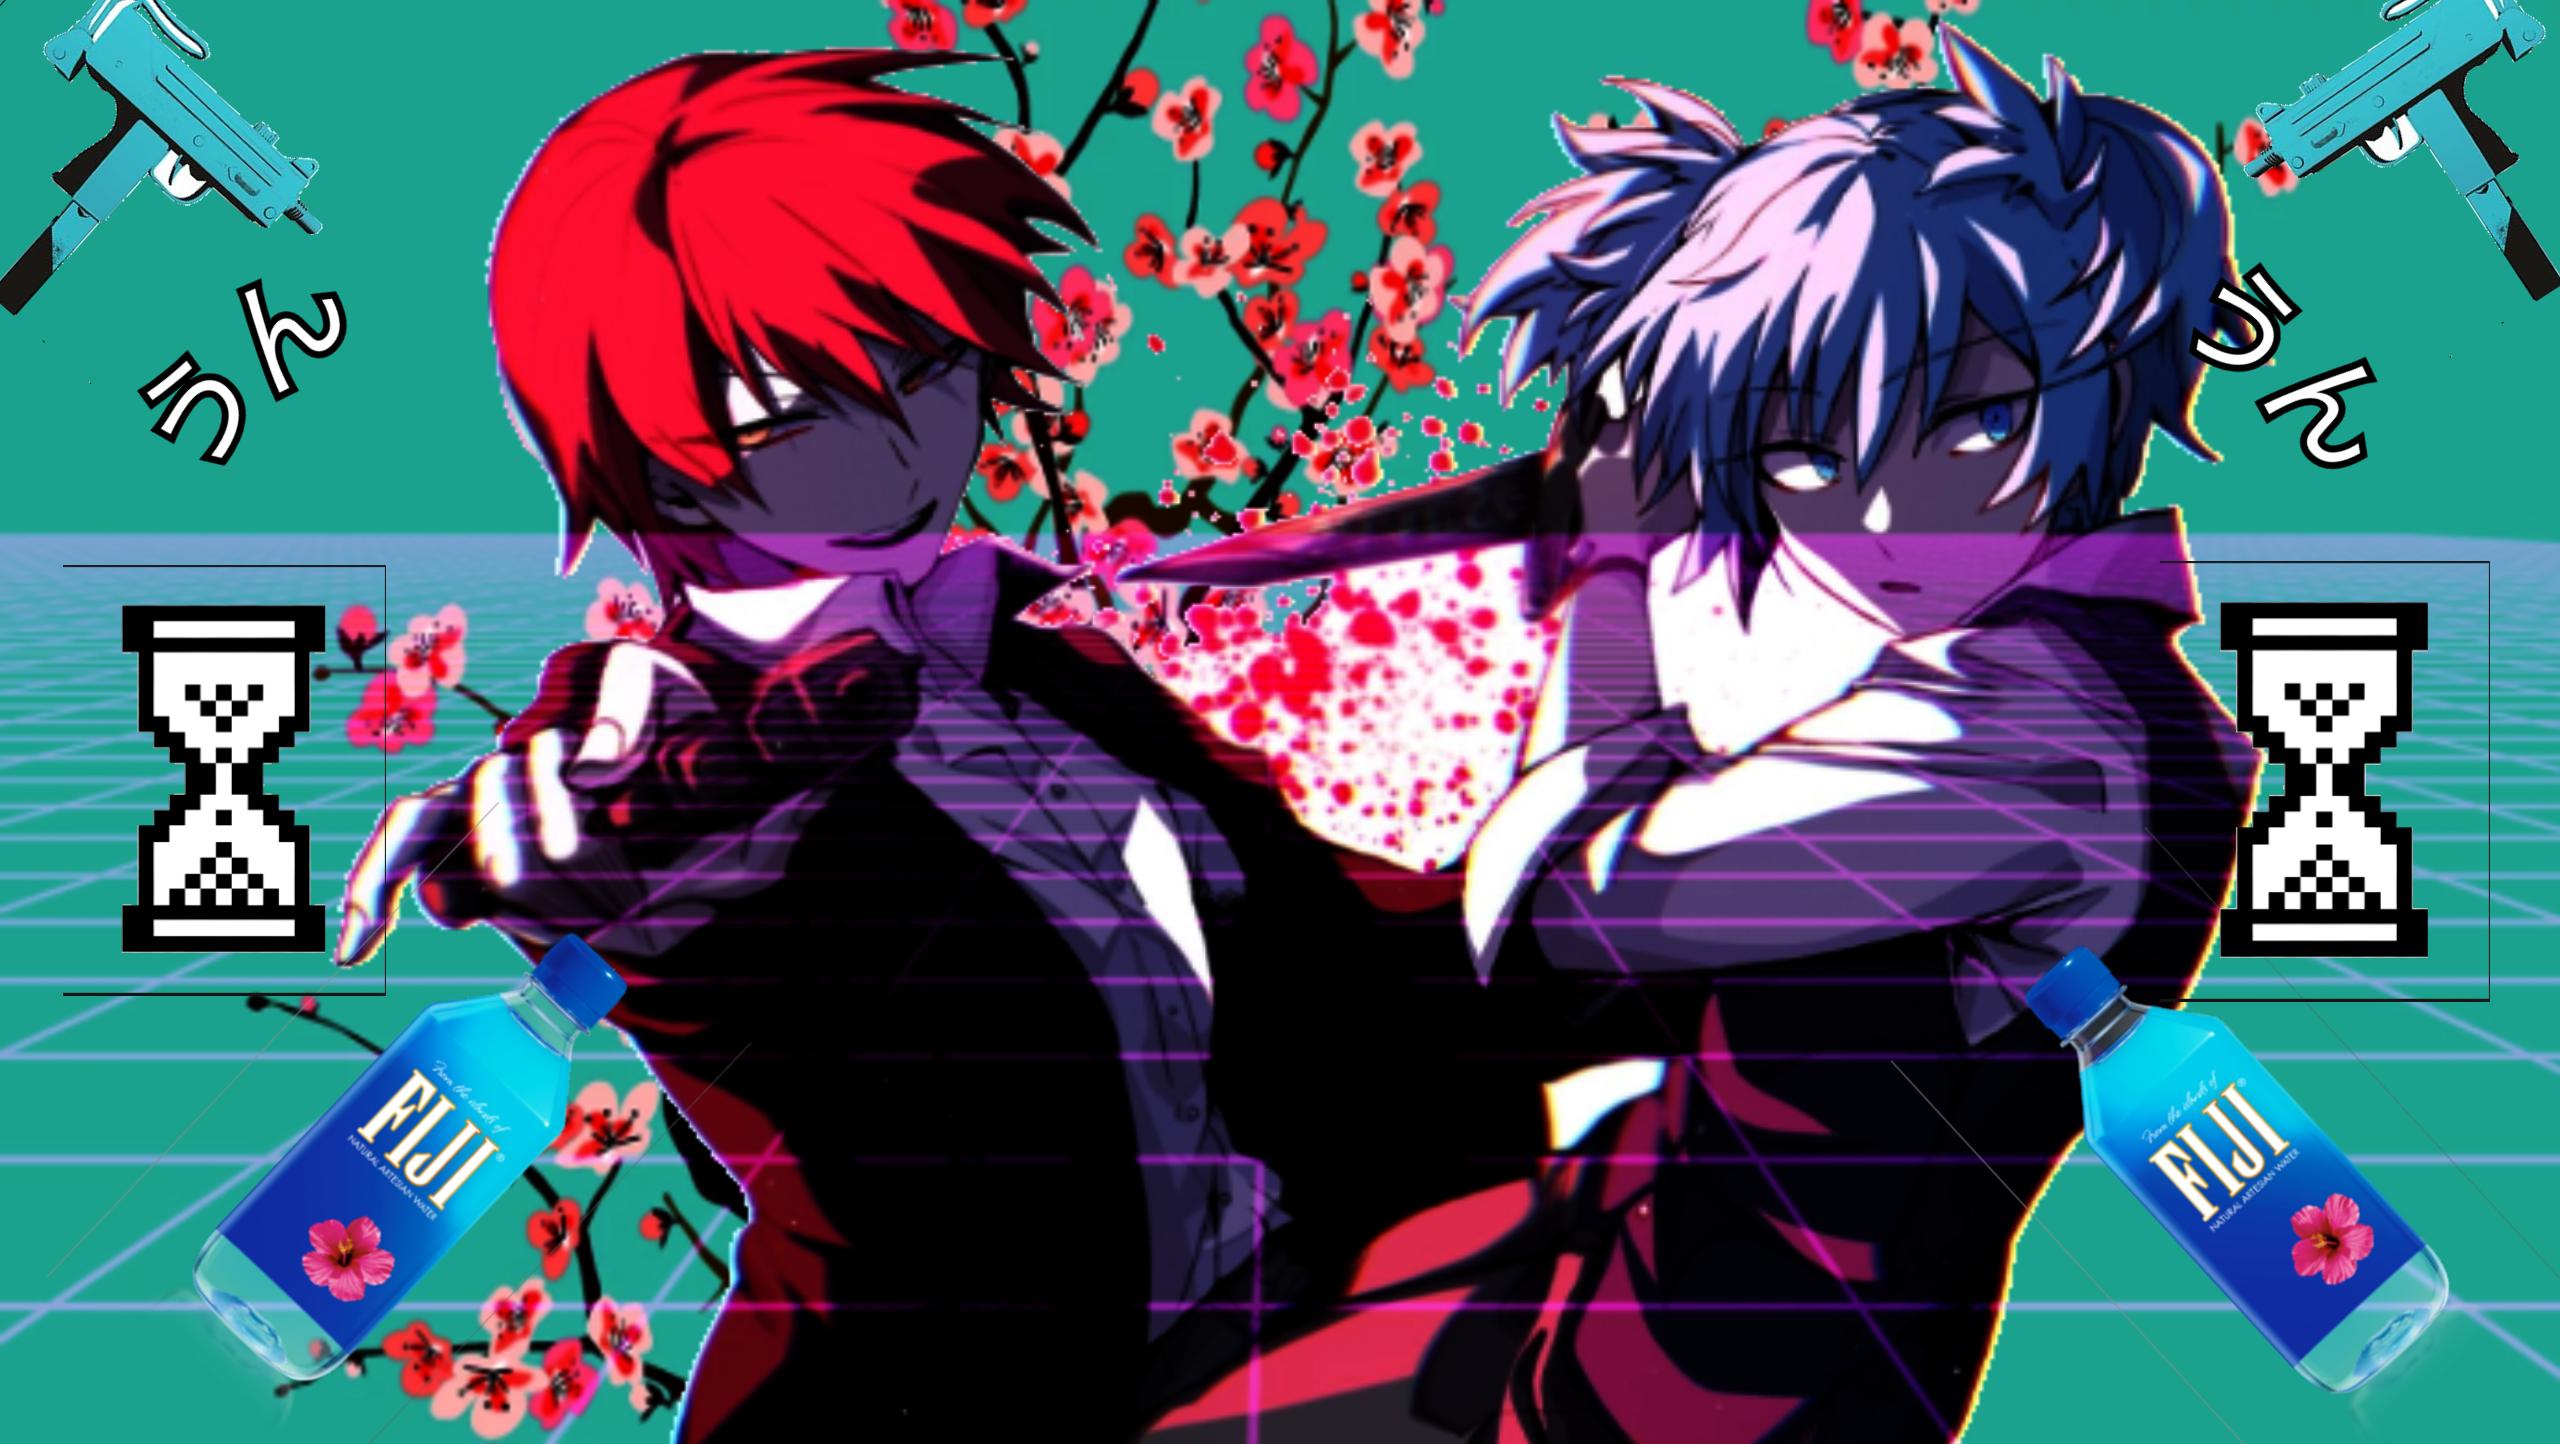 18+ Ultrawide Anime Wallpapers Reddit - Tachi Wallpaper